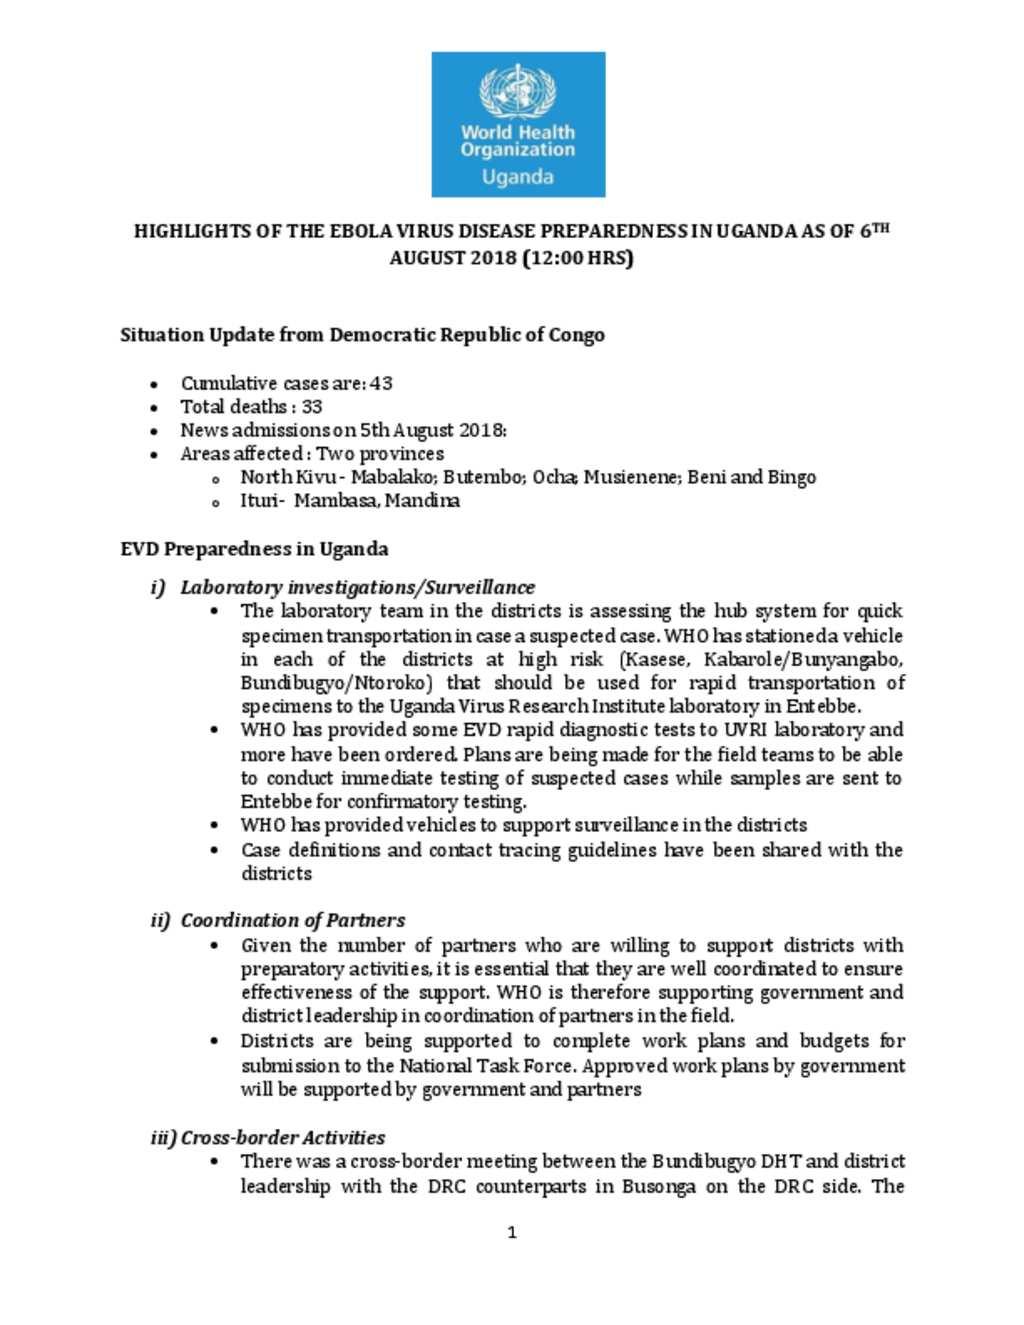 document highlights of the ebola virus disease preparedness in